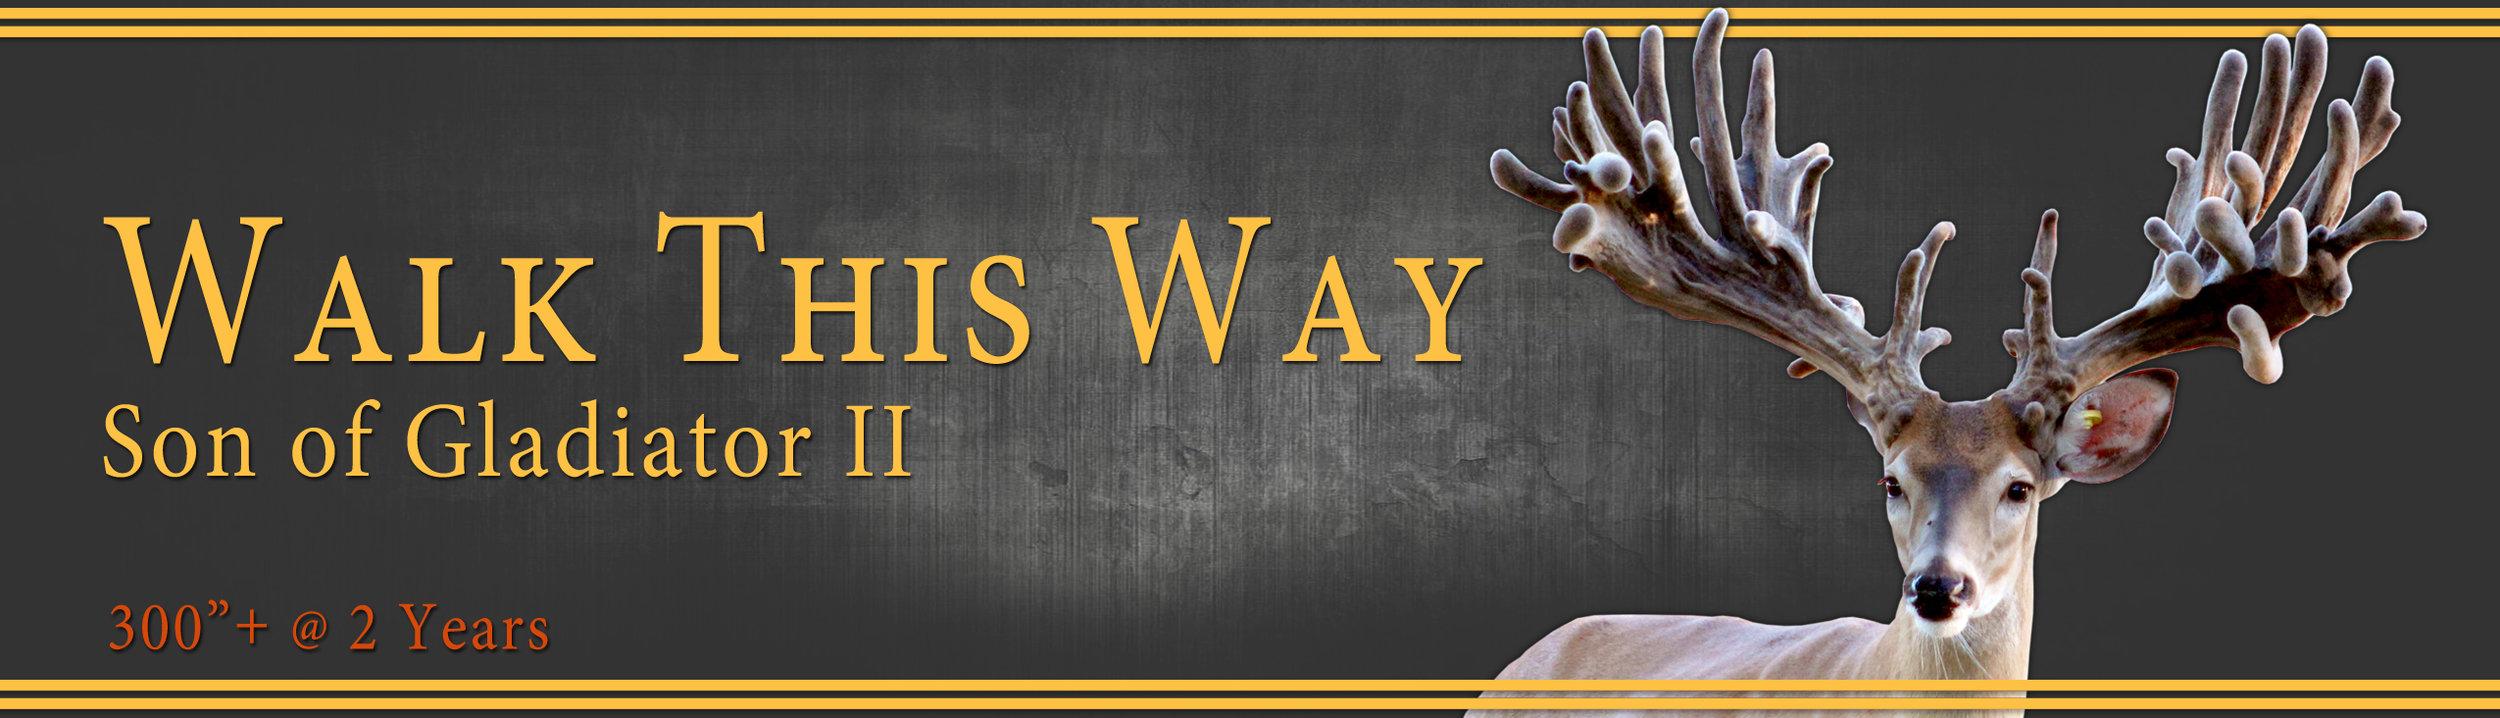 walk this way.jpg